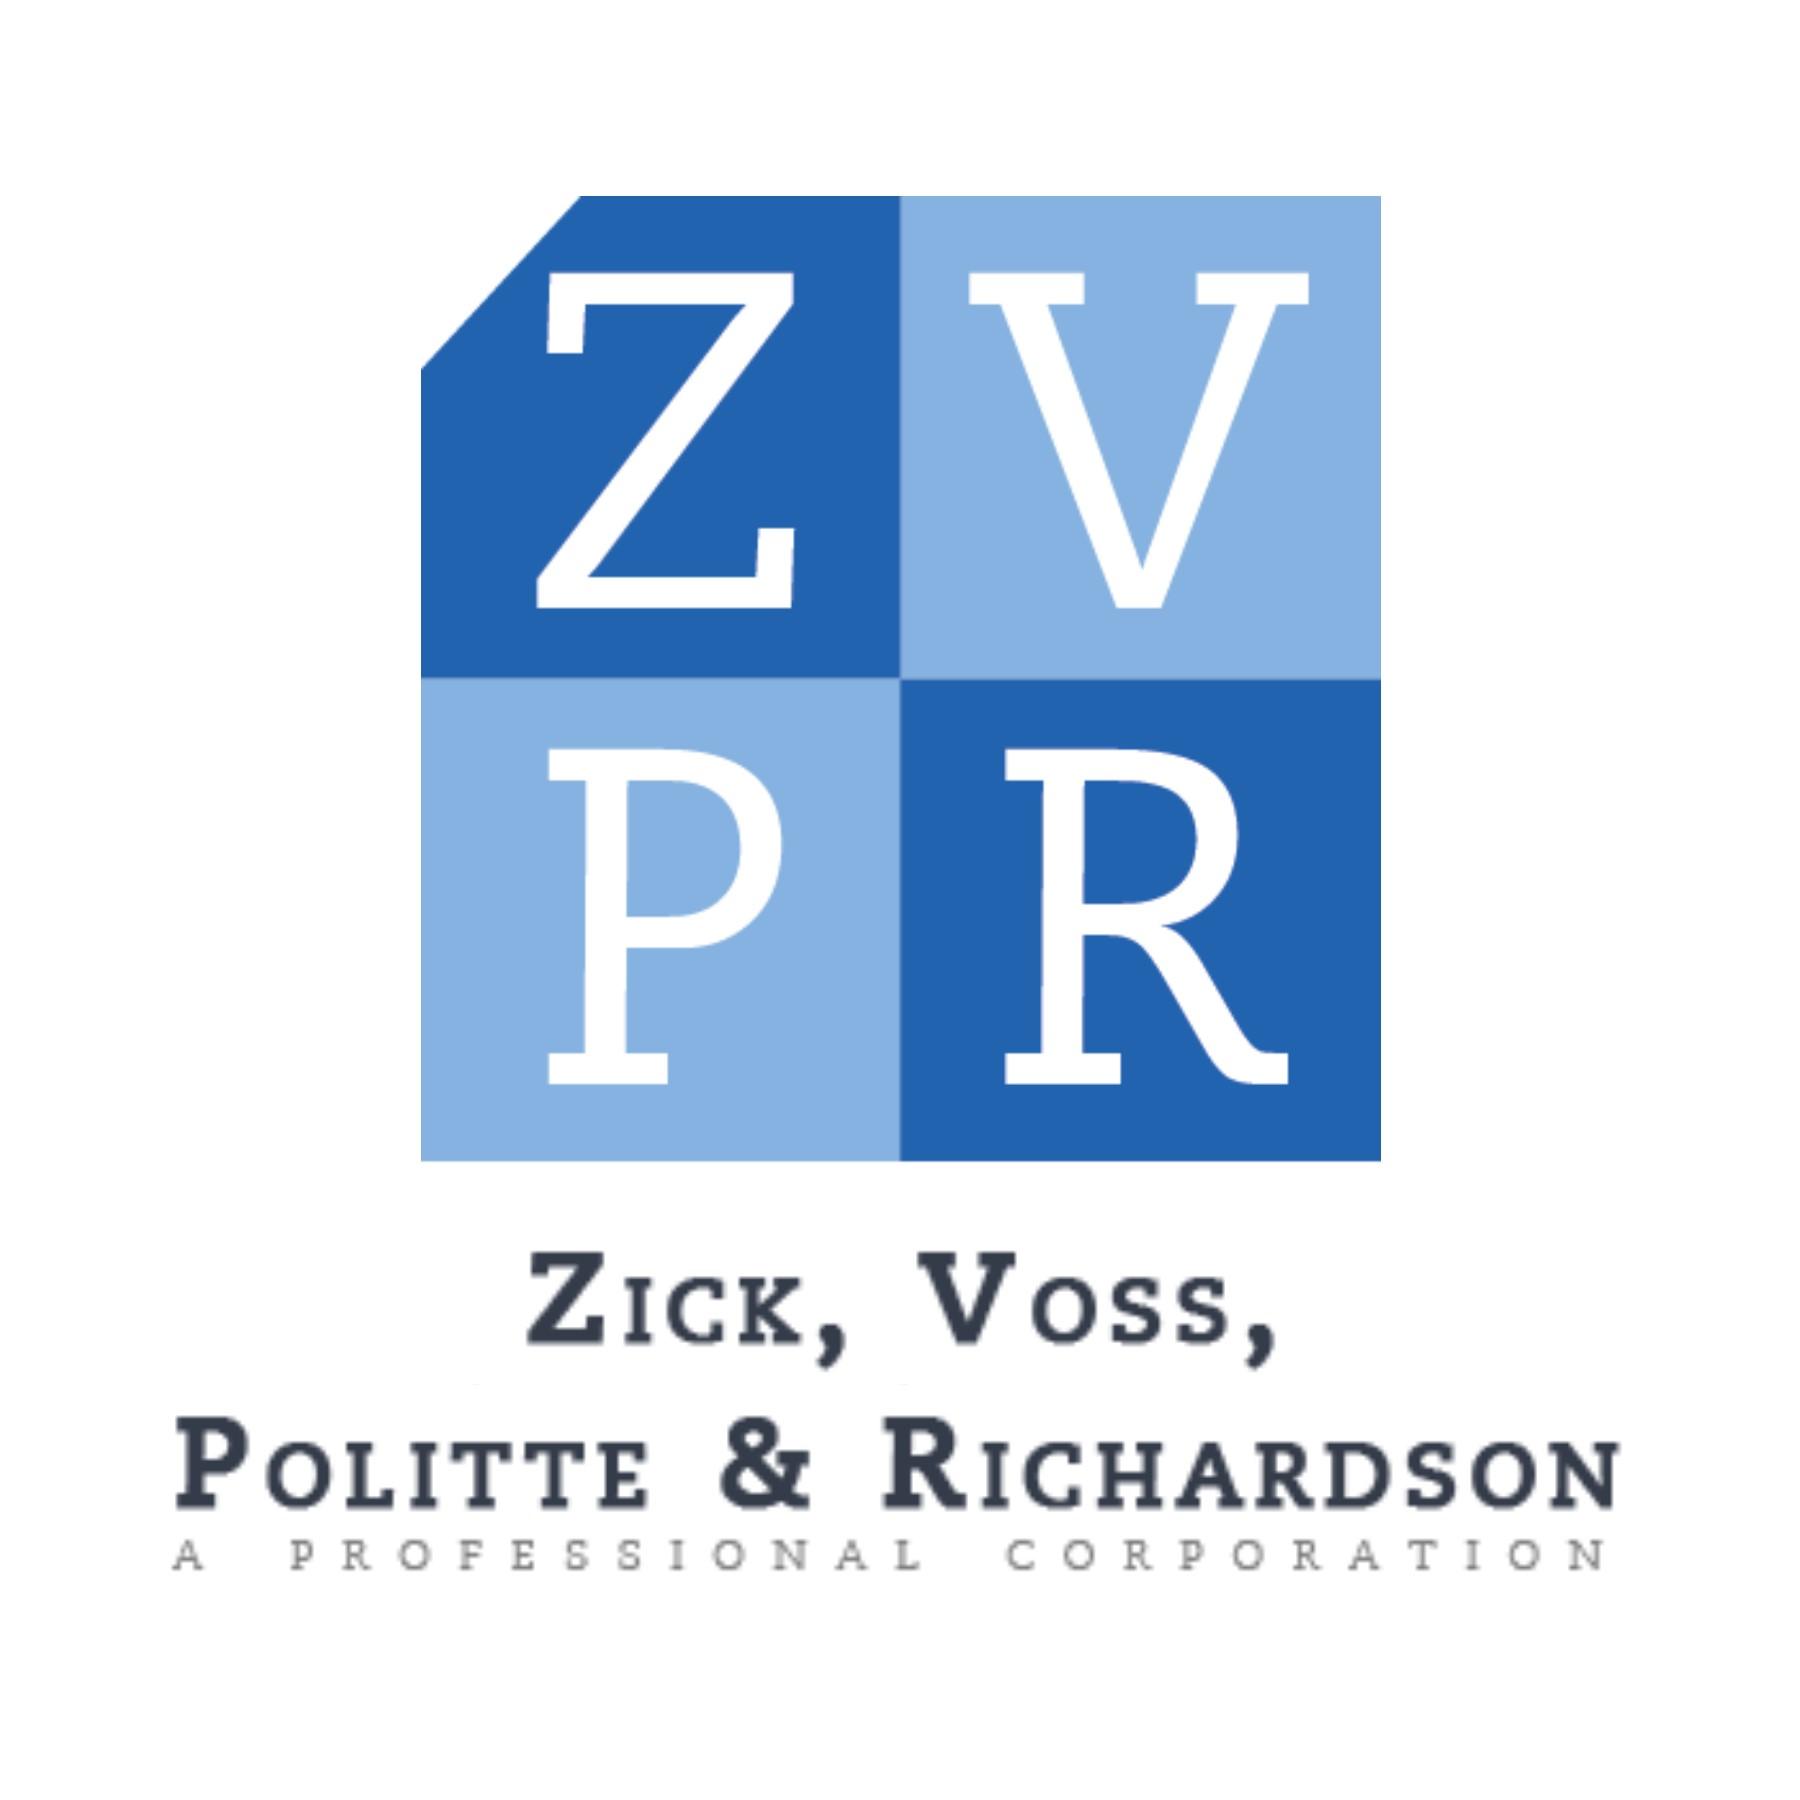 Zick, Voss, Pollitte, & Richardson.jpg